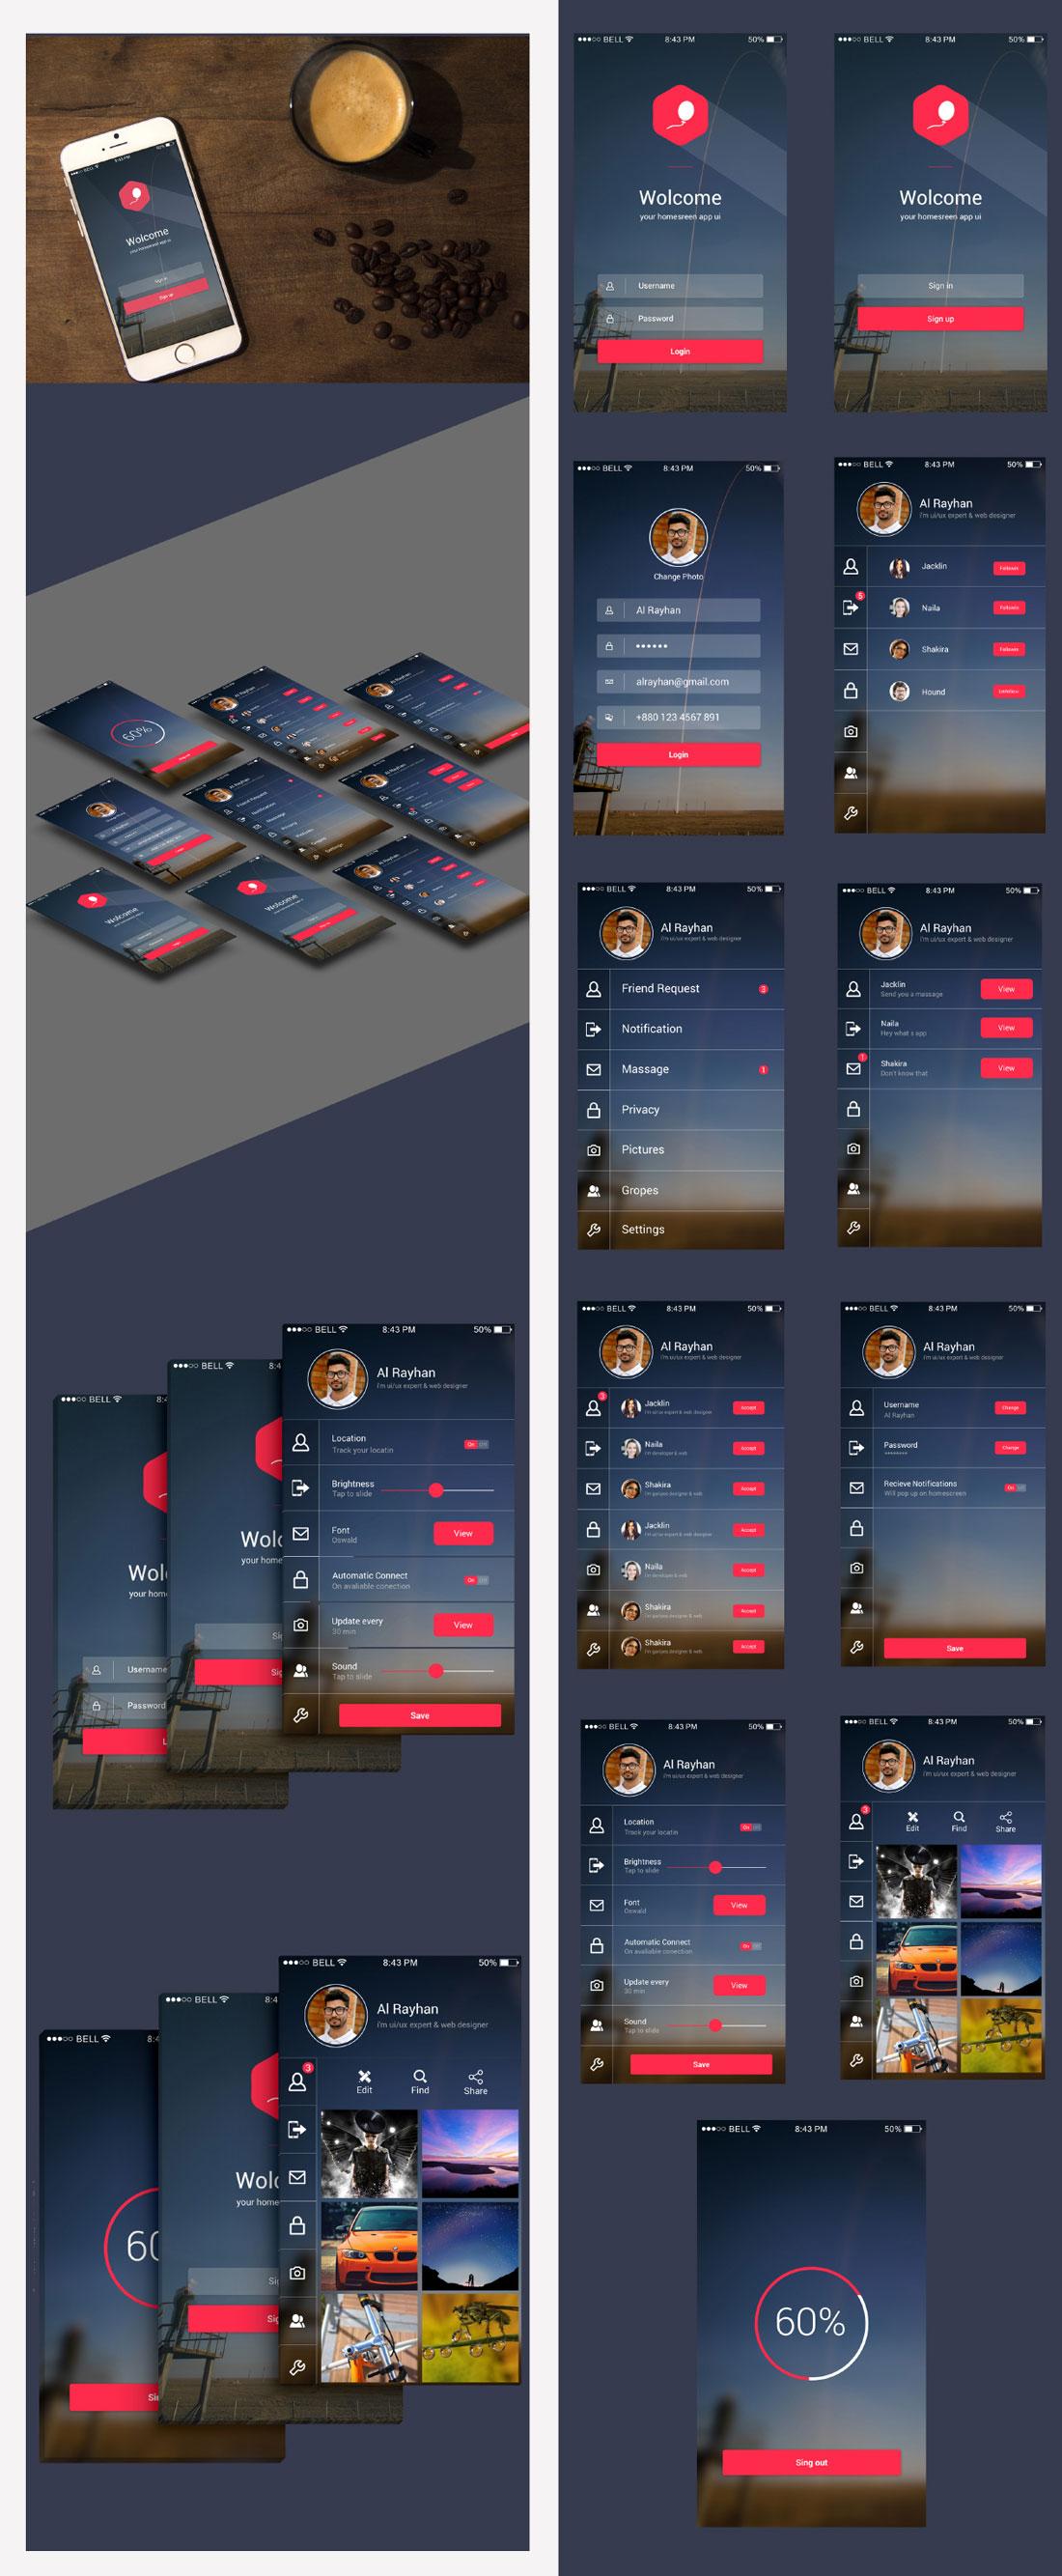 p563 - لایه باز رابط کاربری شبکه اجتماعی فوق العاده زیبا / اینترفیس اپلیکیشن UX و UI موبایل اندورید و ios با صفحات کاربردی و متنوع